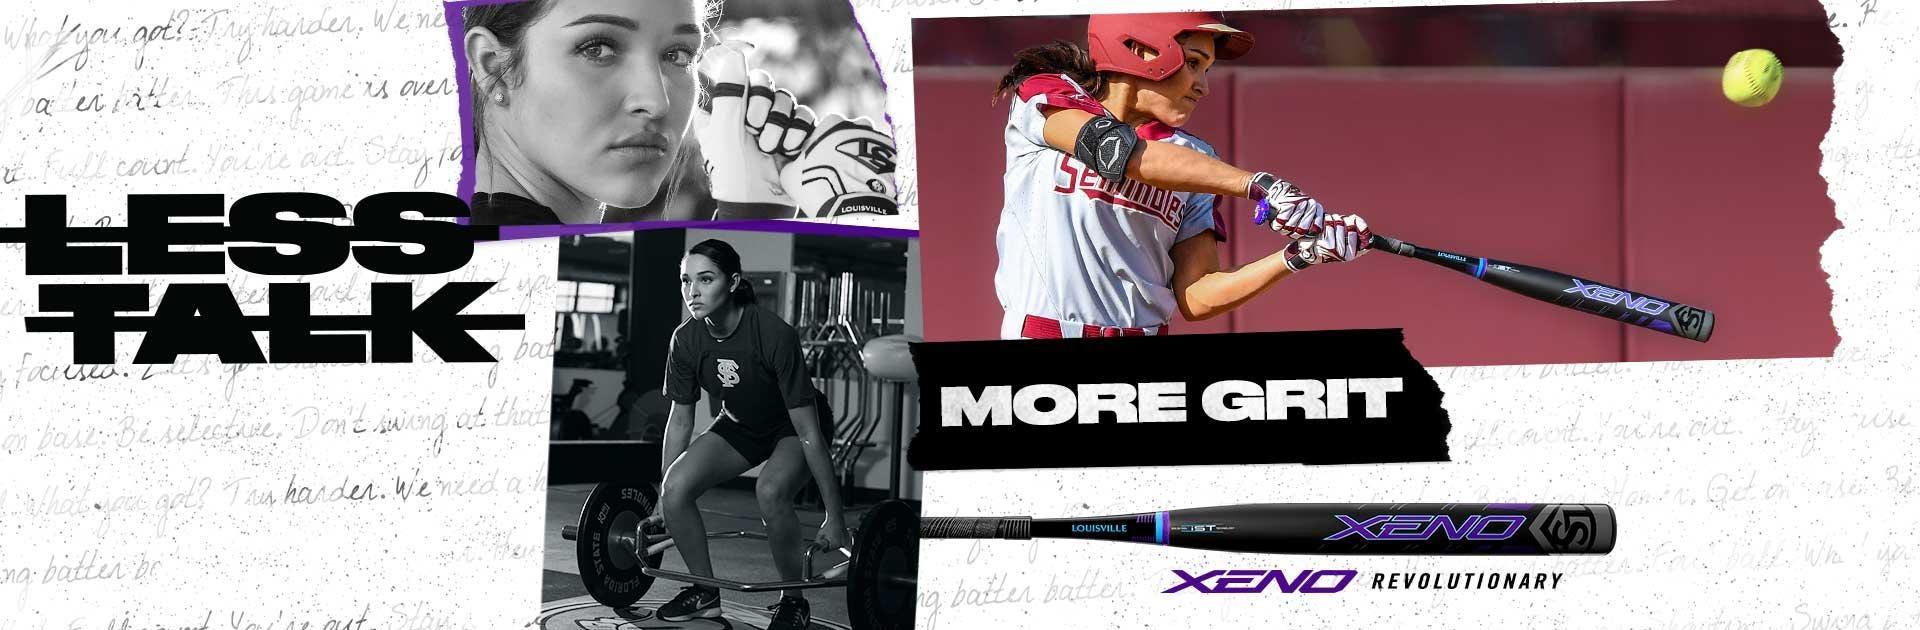 Louisville Slugger Xeno Fastpitch Softball Bats | Less Talk. More Grit.